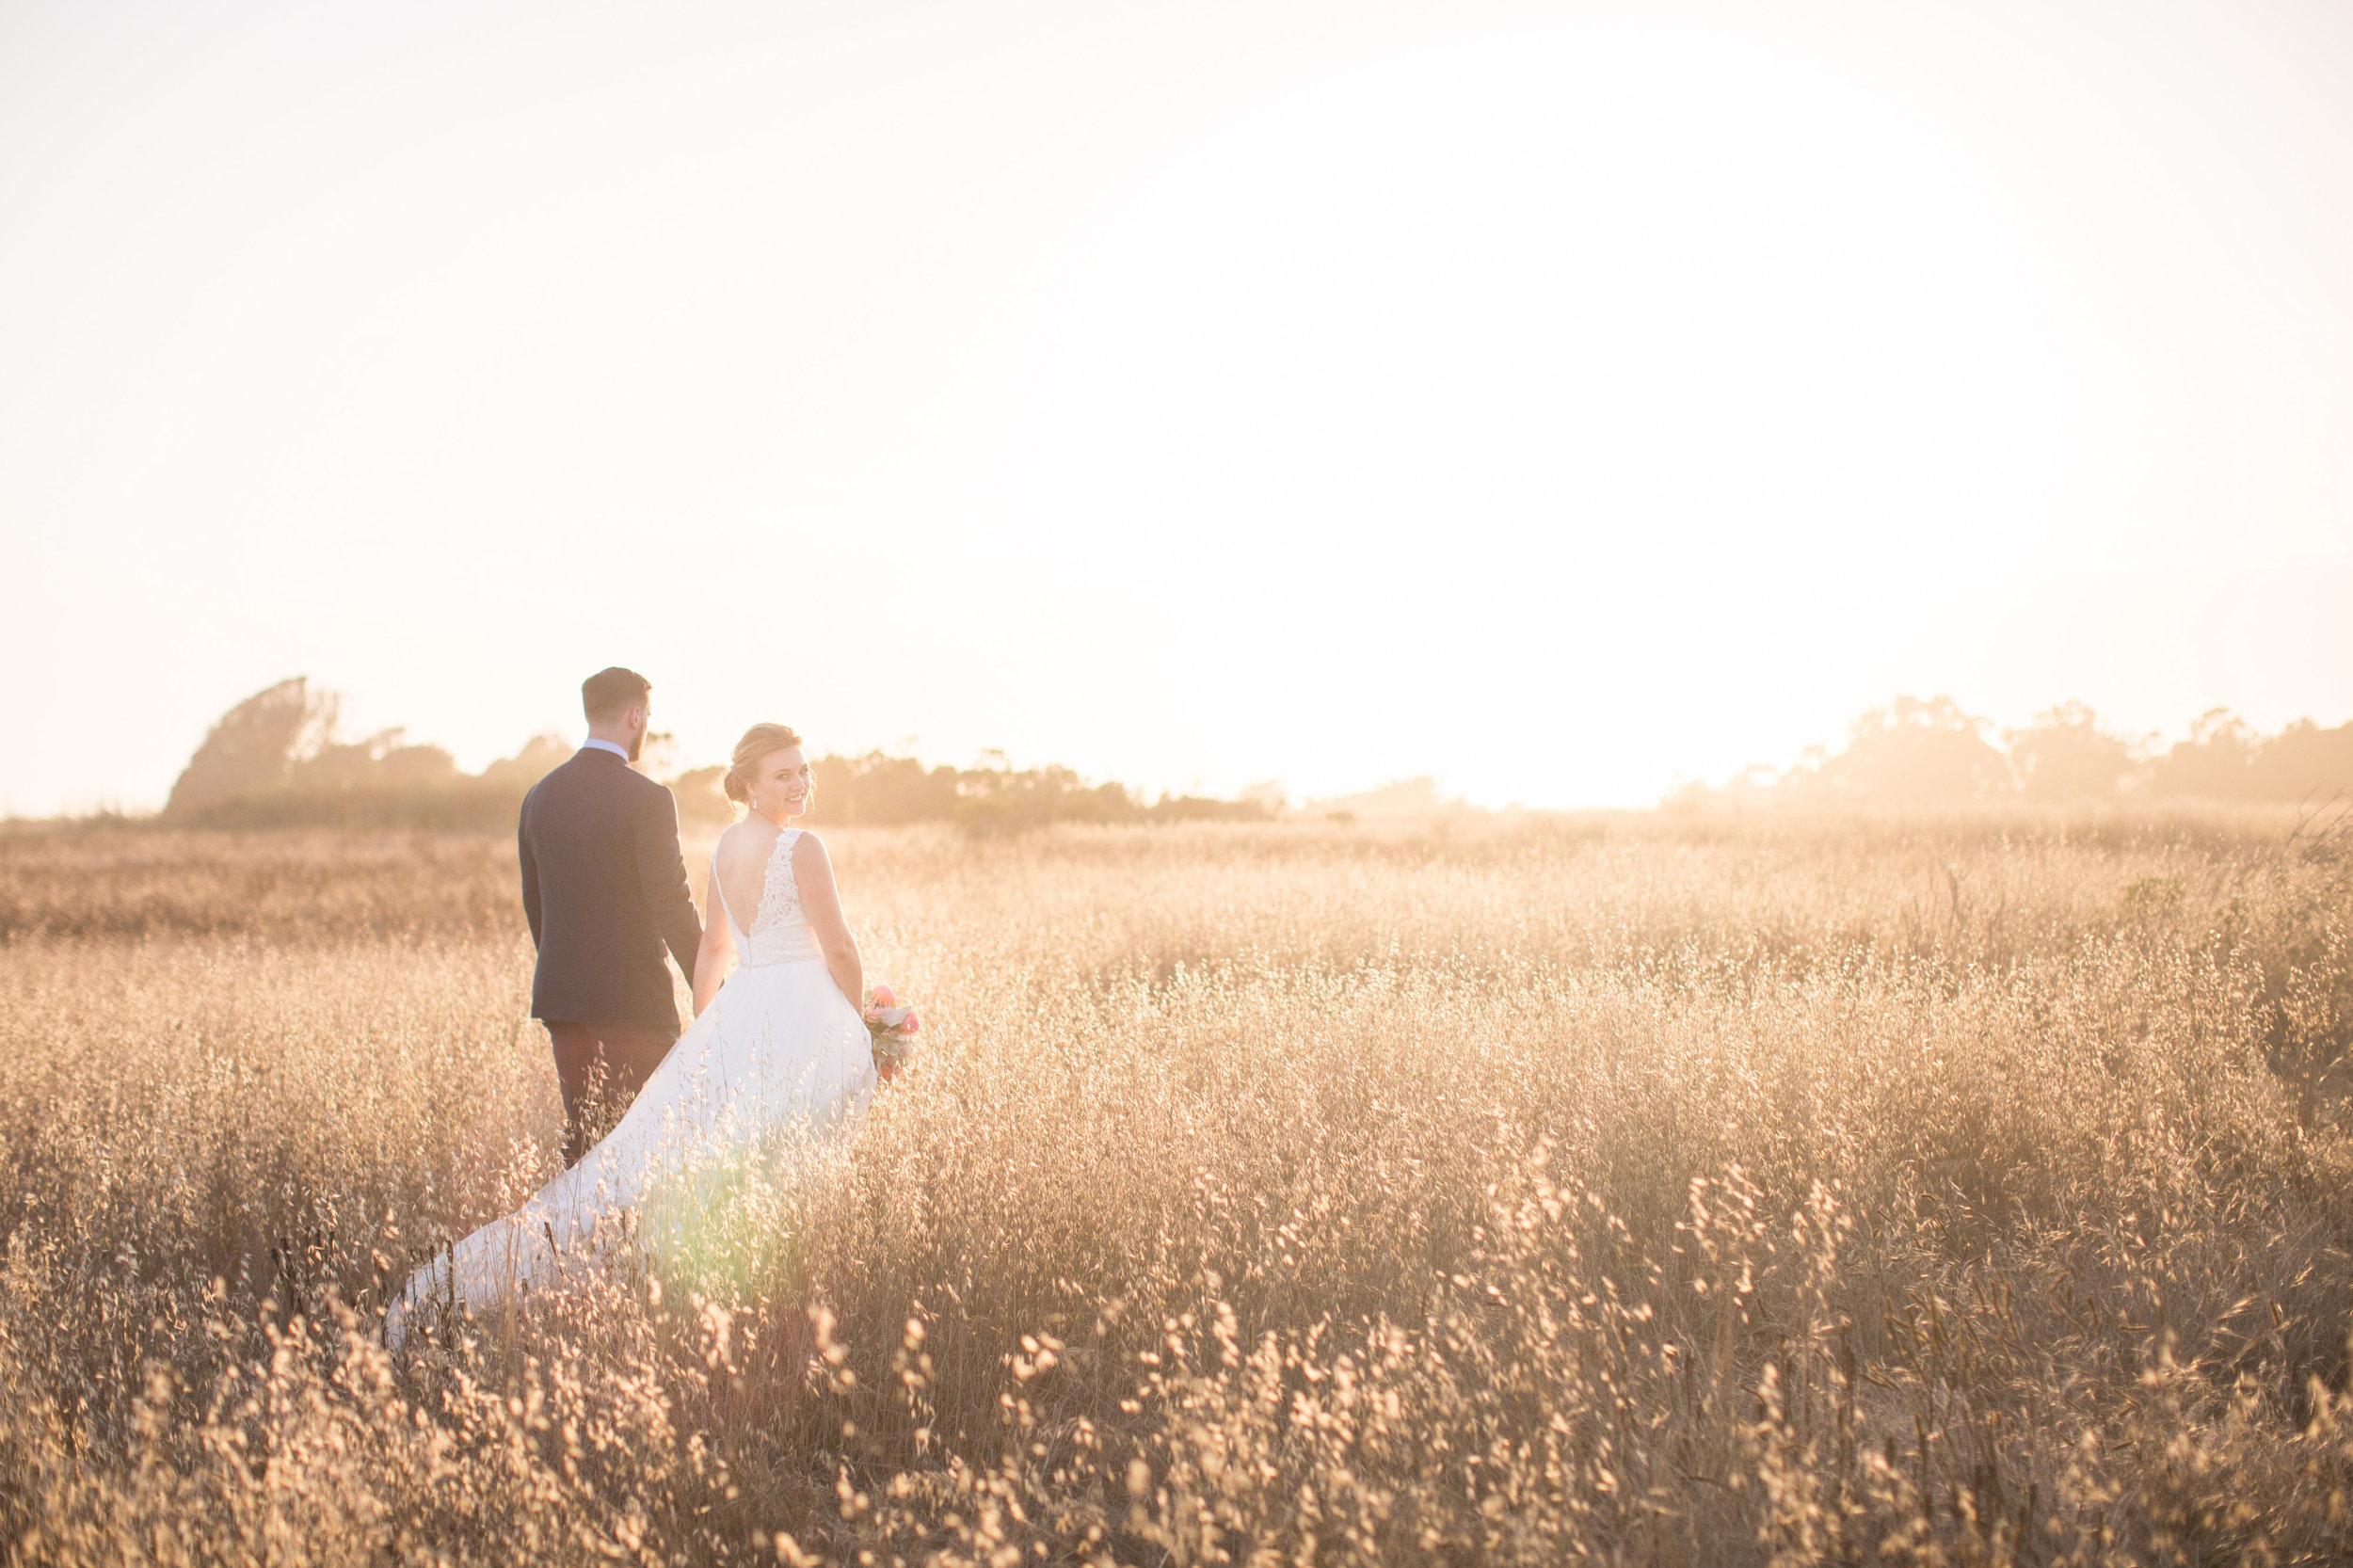 santa-barbara-elopement-elope-wedding-planning-planner-coordinator-day-of-rustic-ellwood-bluffs-beach-front-ocean-view (12).jpg